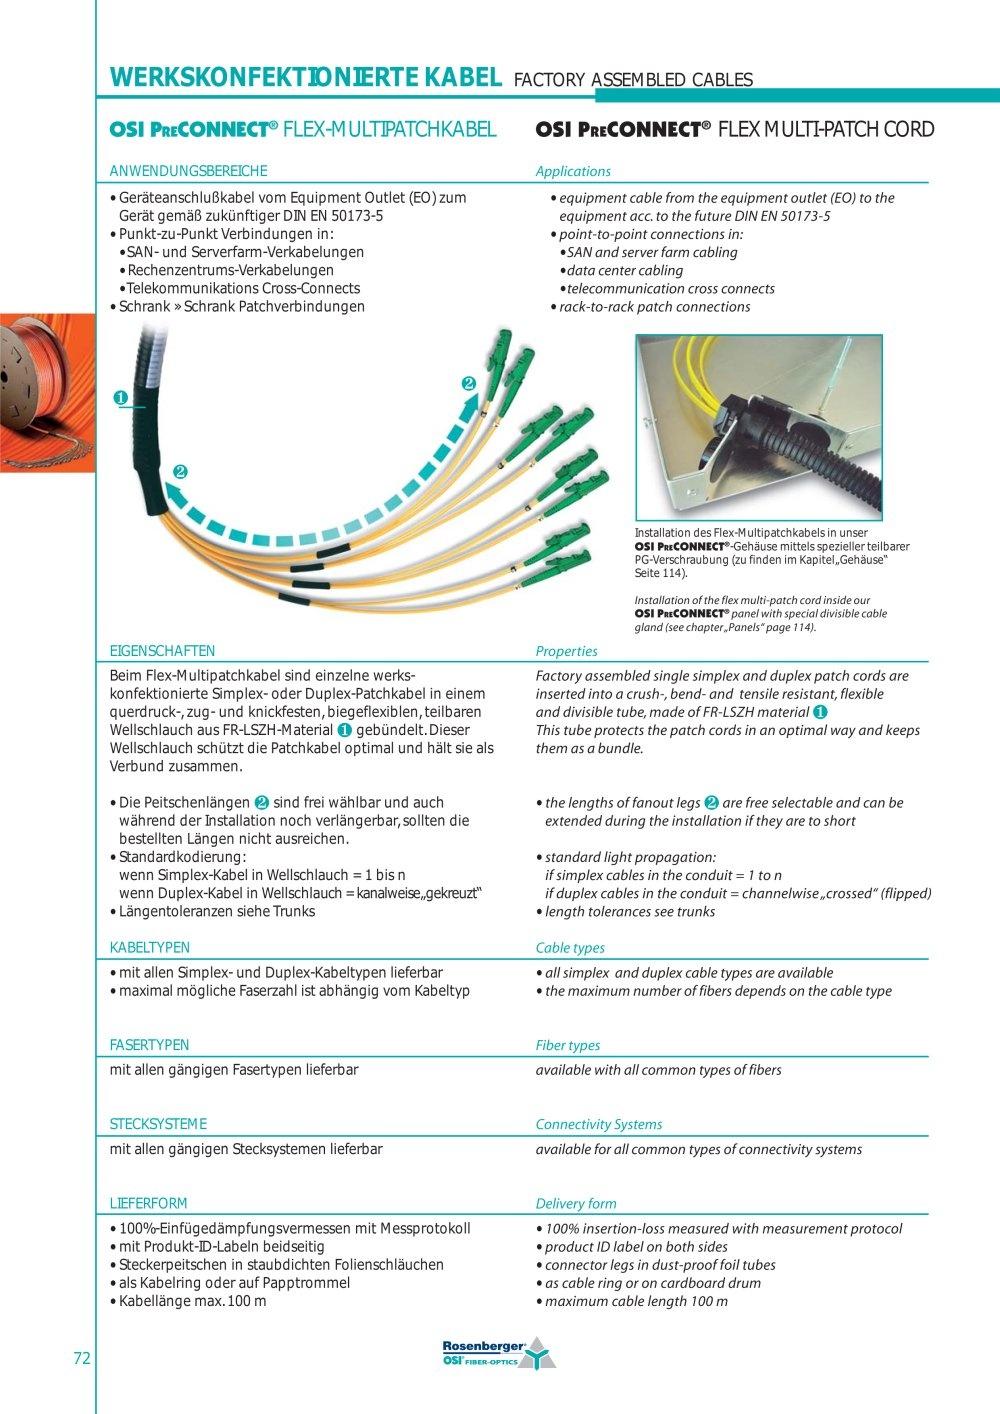 Osi Preconnect Flex Multi Patch Cord Rosenberger Pdf Mtpmpocrossovercablediagram1jpg 1 2 Pages